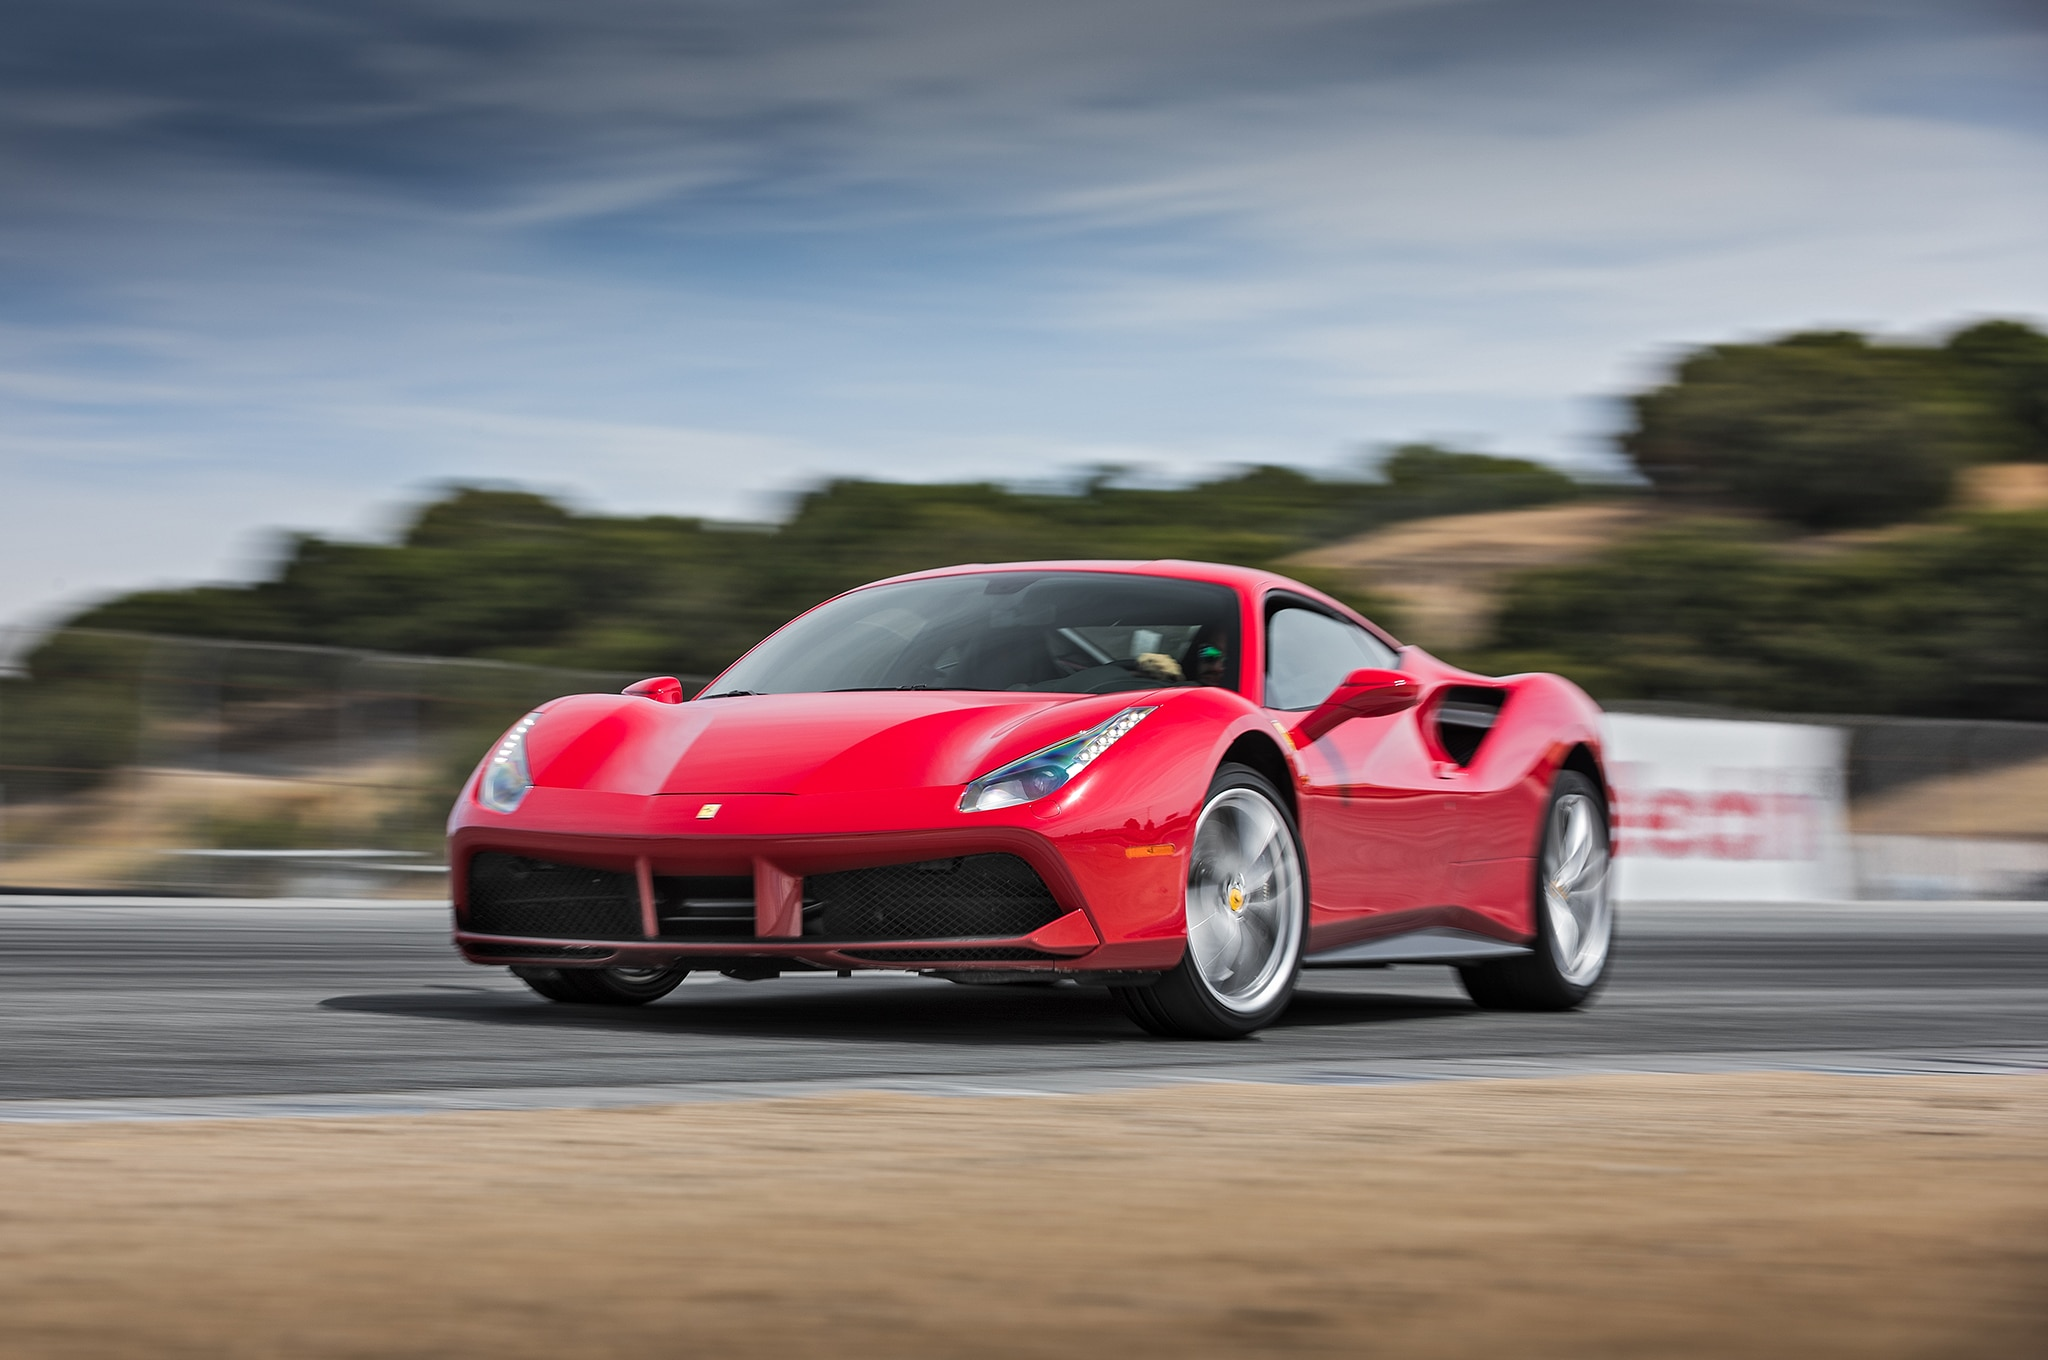 2016 Ferrari 488 GTB Front Three Quarter In Motion 01